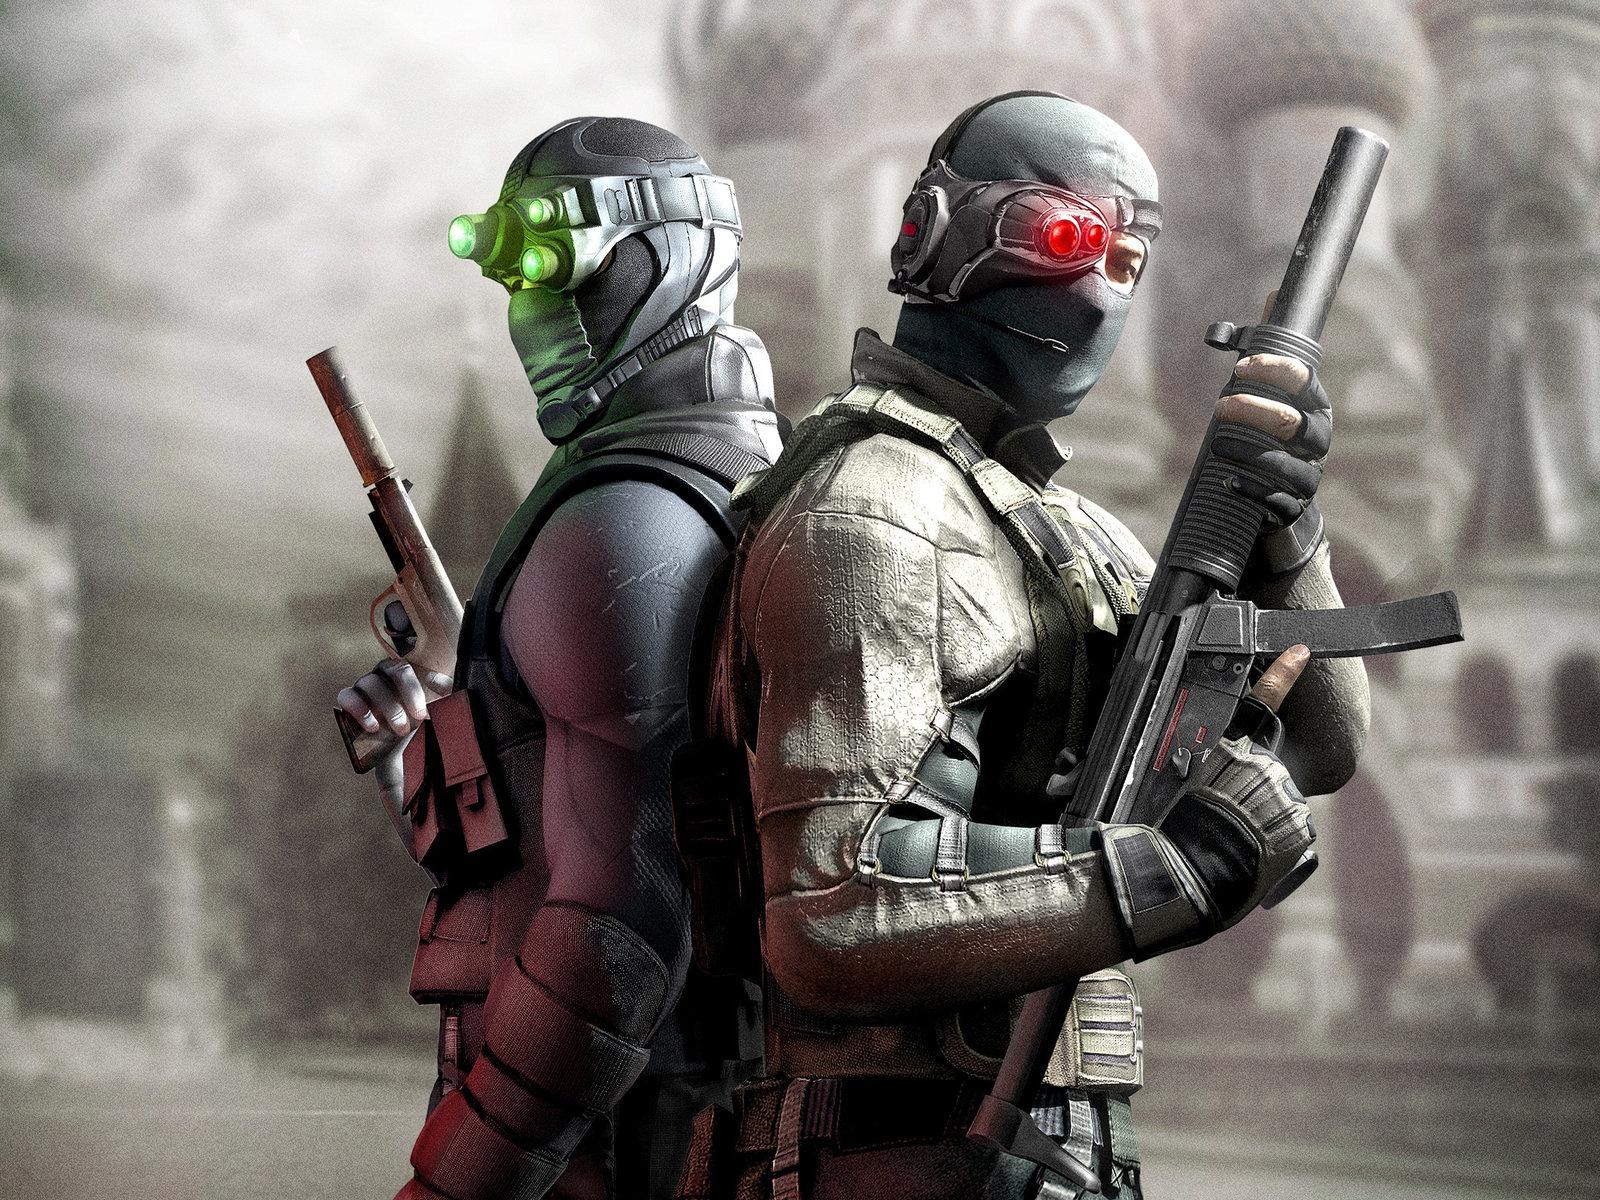 Games_new_game_Splinter_Cell__Conviction_023243_.jpg